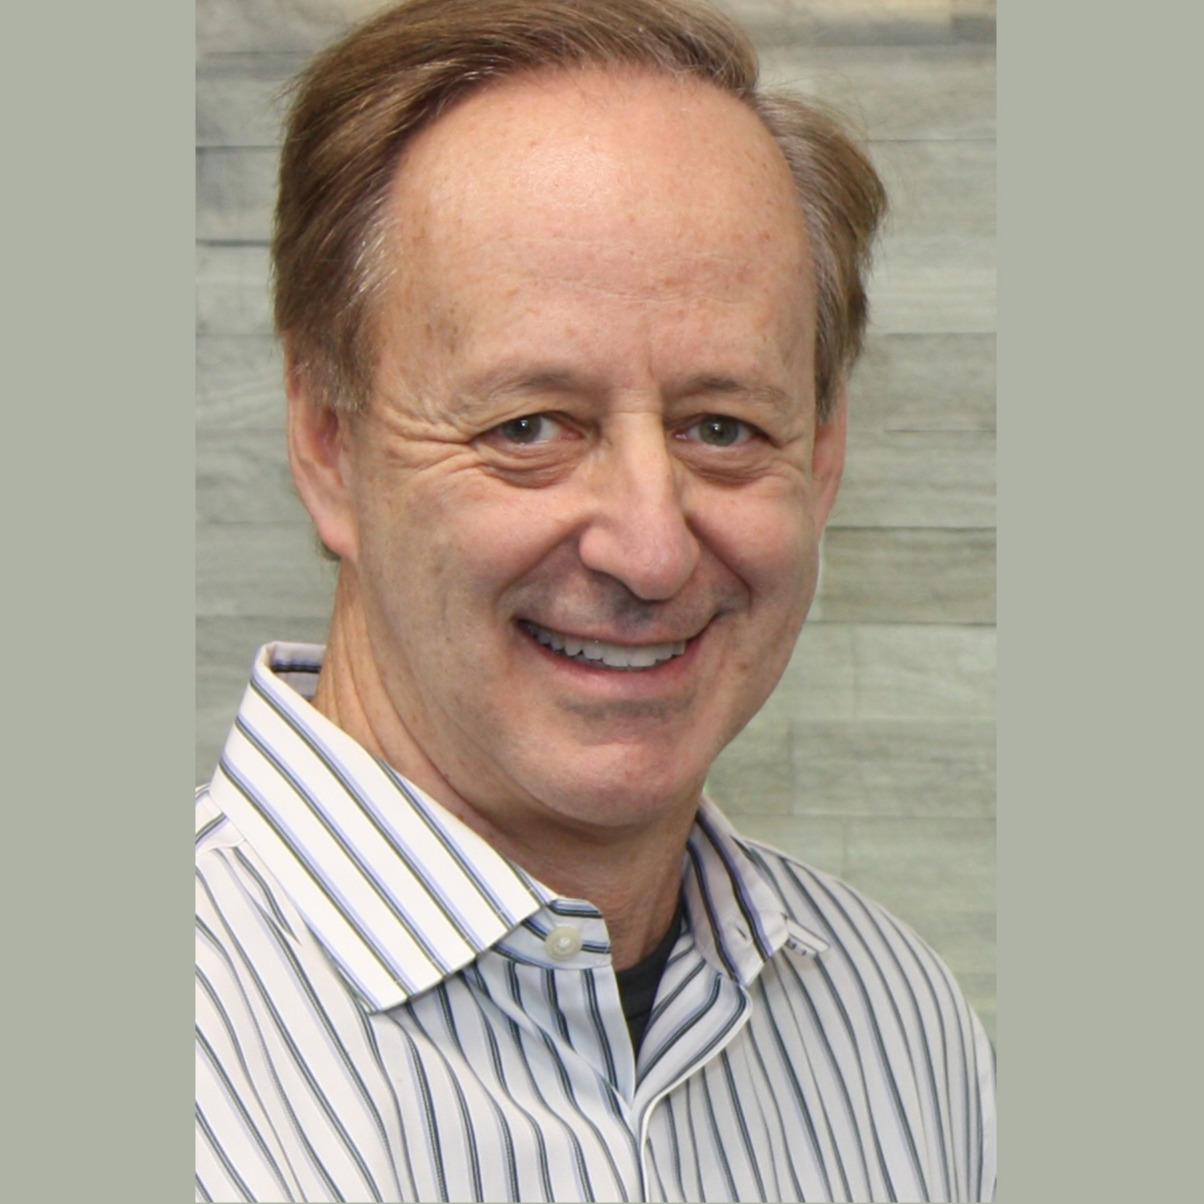 Dr. Larry D. Burt, DMD